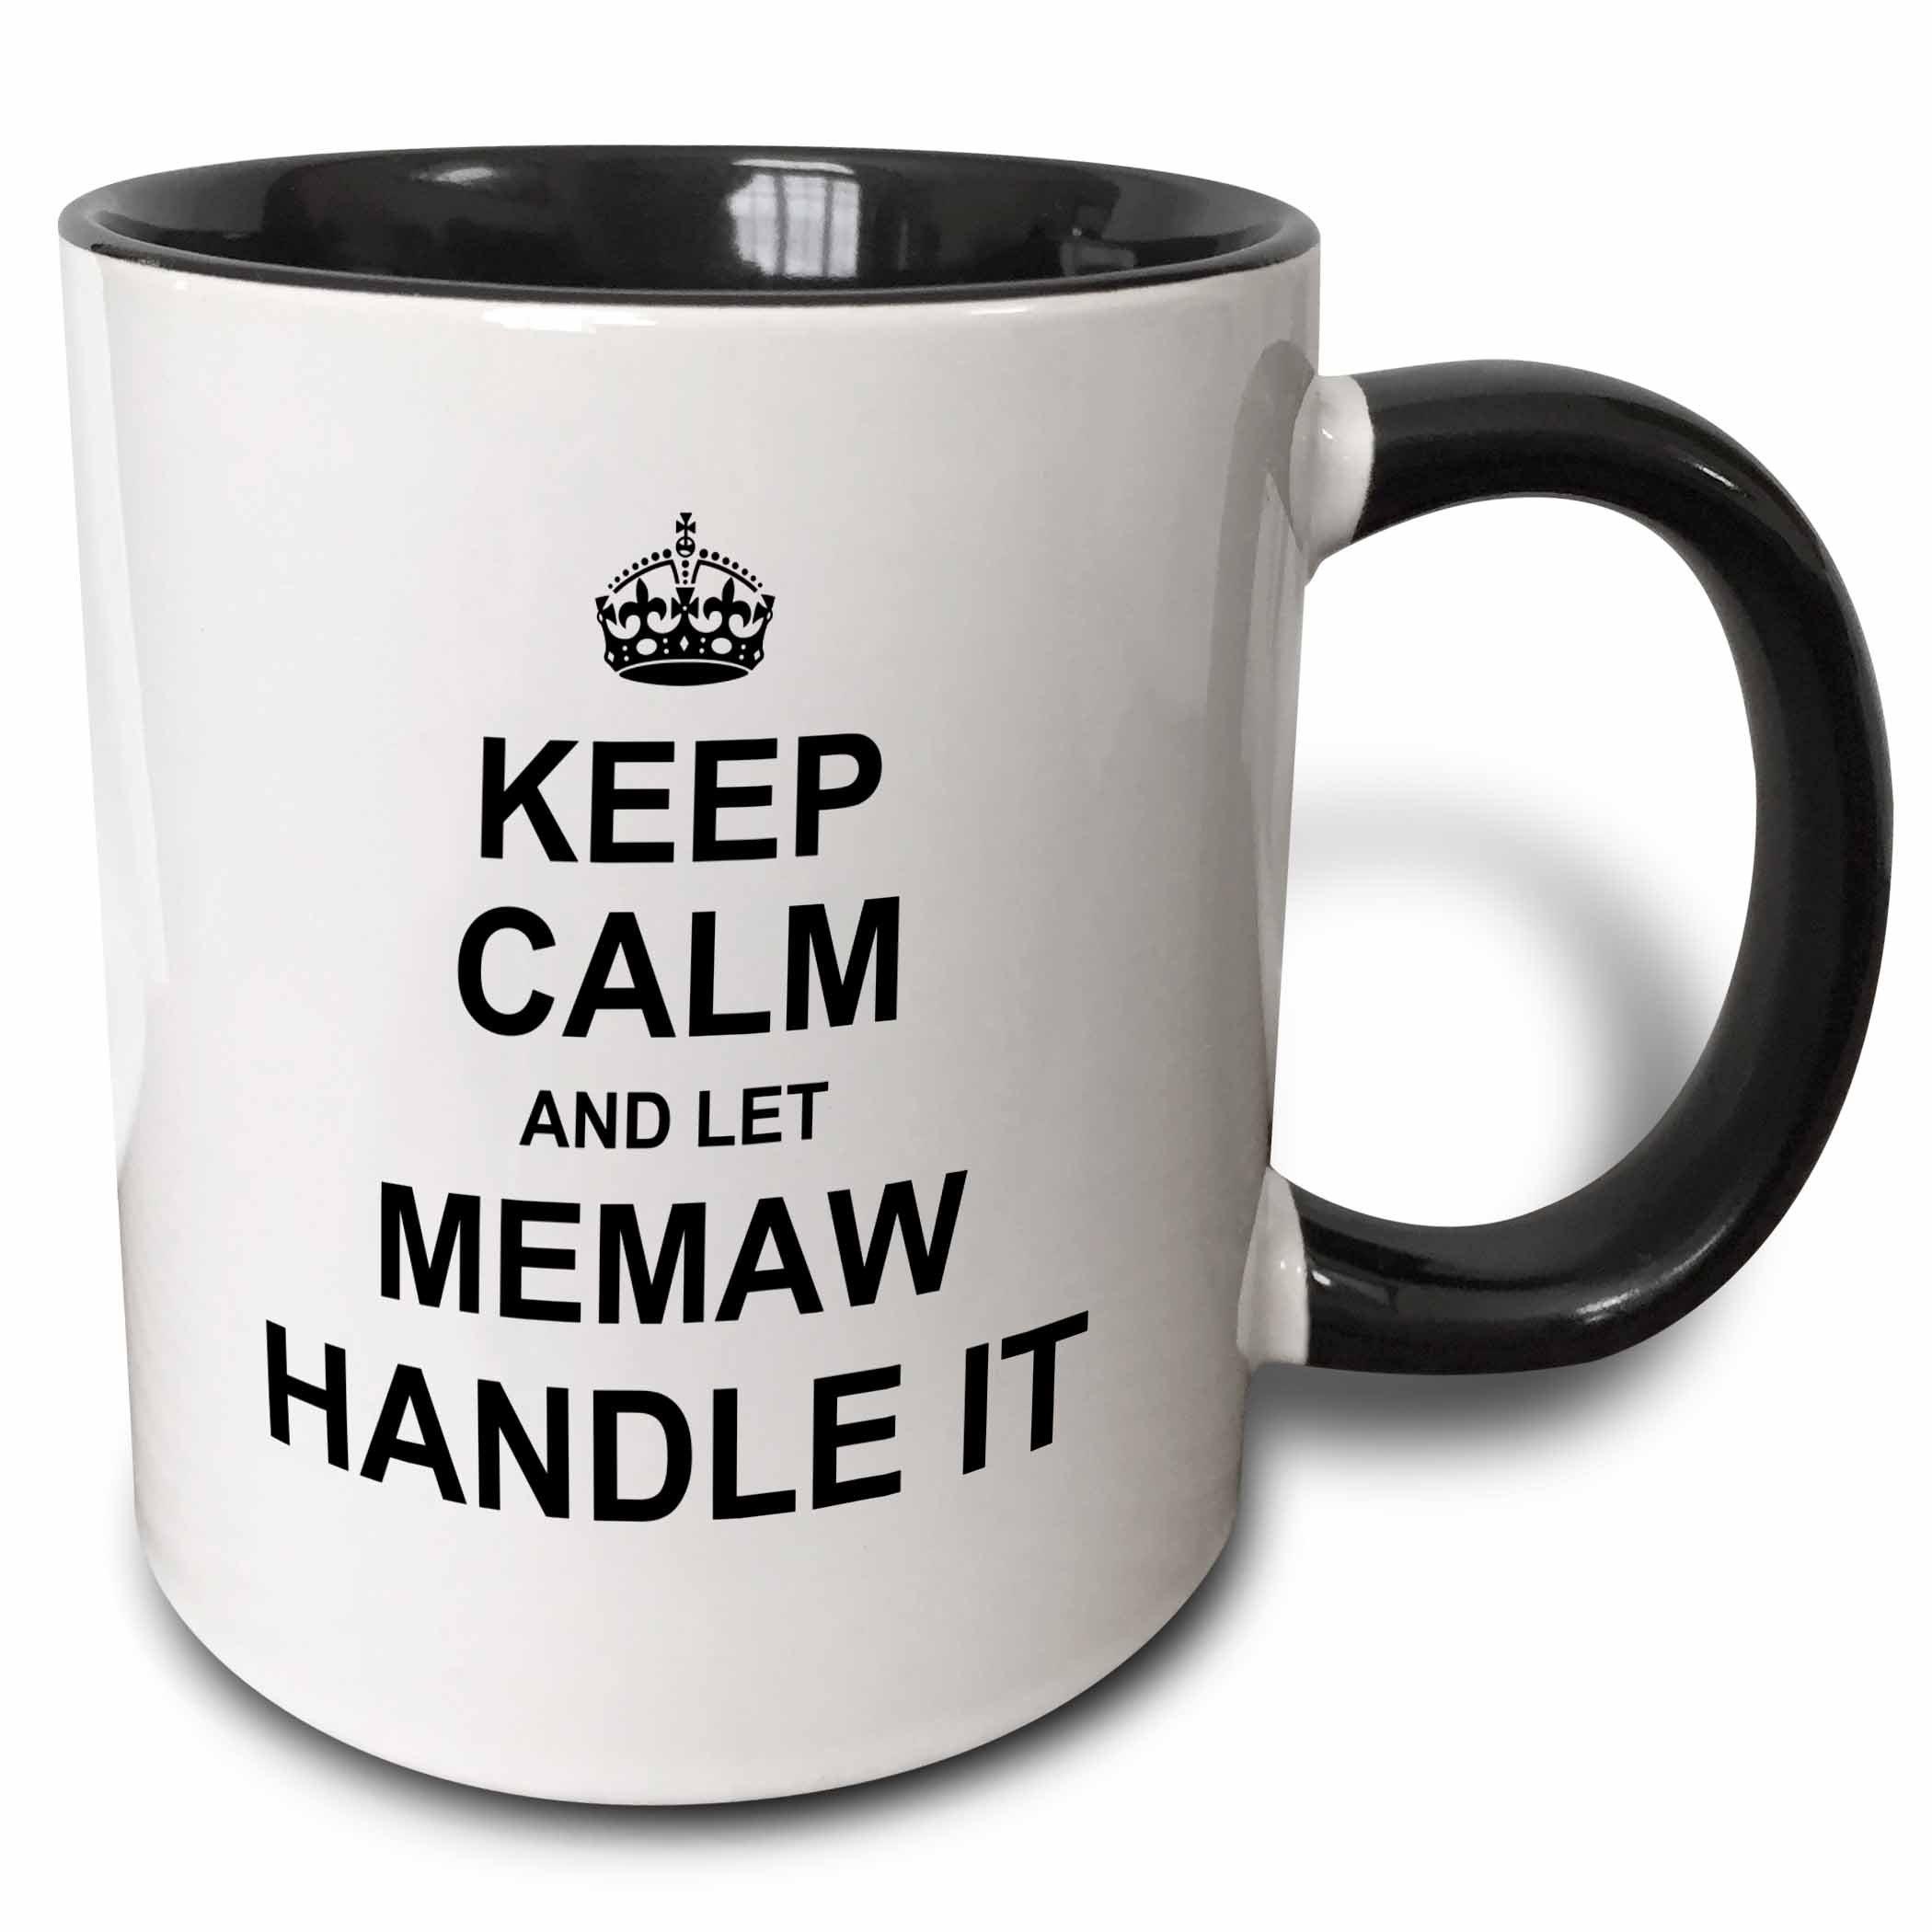 3dRose Keep Calm And Let Memaw Handle It-Fun Funny Grandma Grandmother Gift Ceramic Mug, 11 oz, Black/White